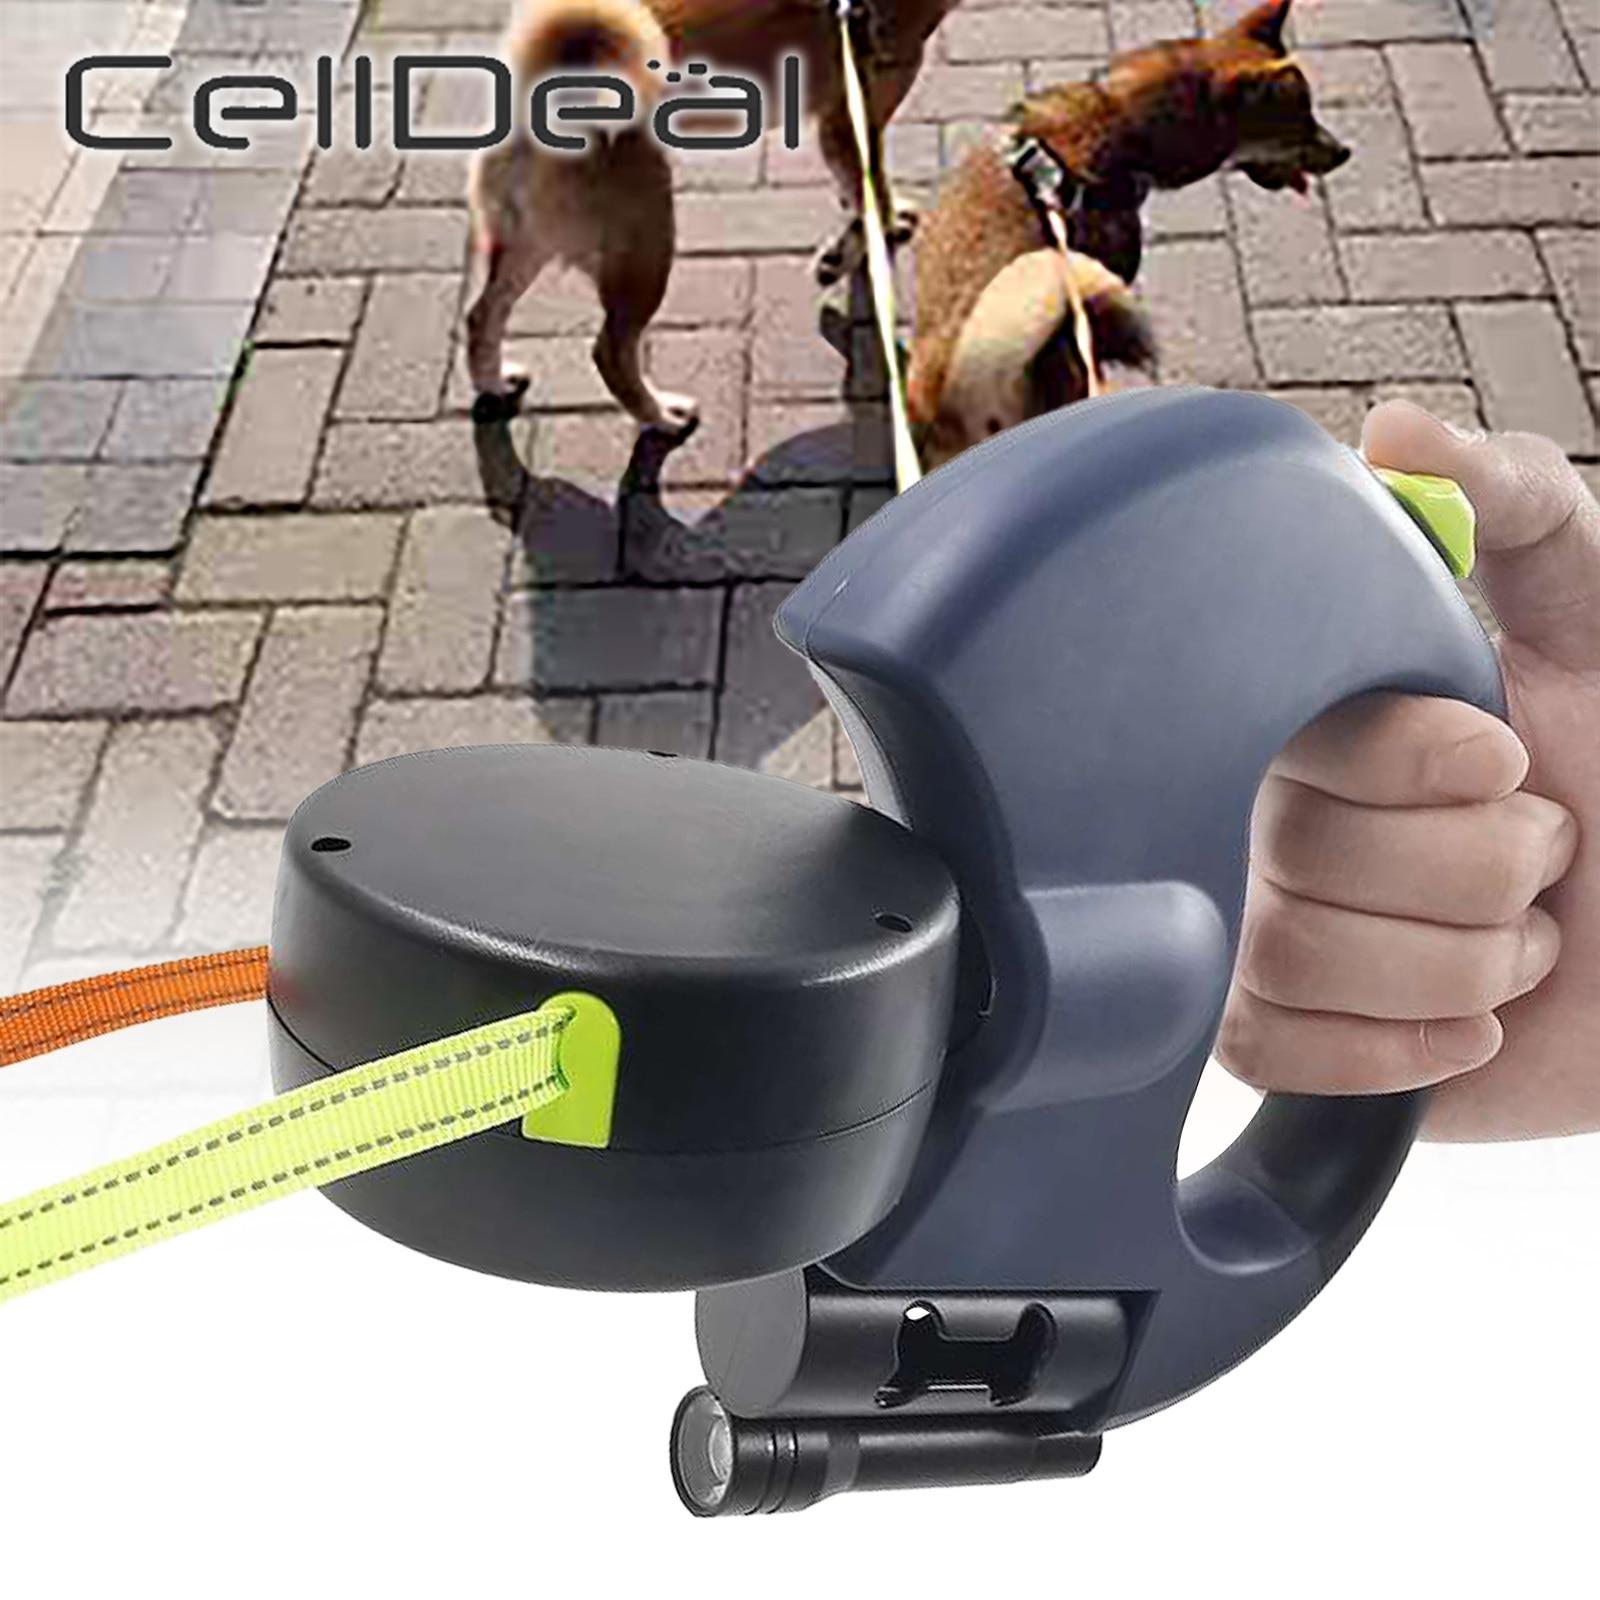 2 Color Retractable Dual Double Pet Leash Rope Zero Tangle Walk For Two Dog Walk The Dog Adjustable Pet Leash Pet Supplies